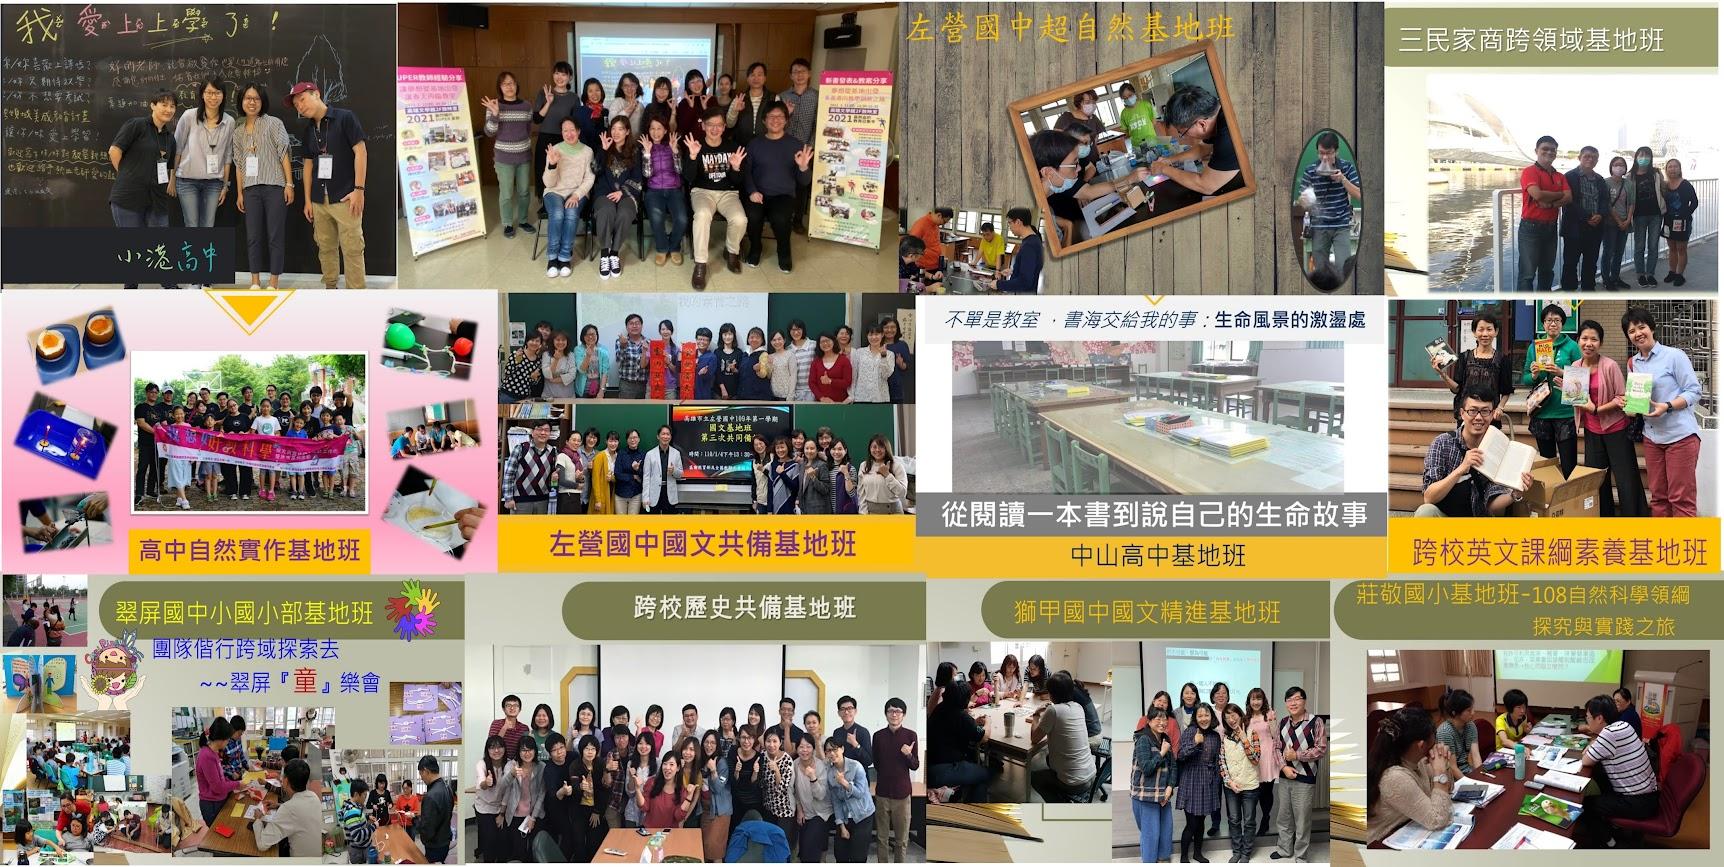 https://sites.google.com/a/kta.kh.edu.tw/indexpage/home/trdcpage/trdc_index/zhuan-ye-zhi-chi